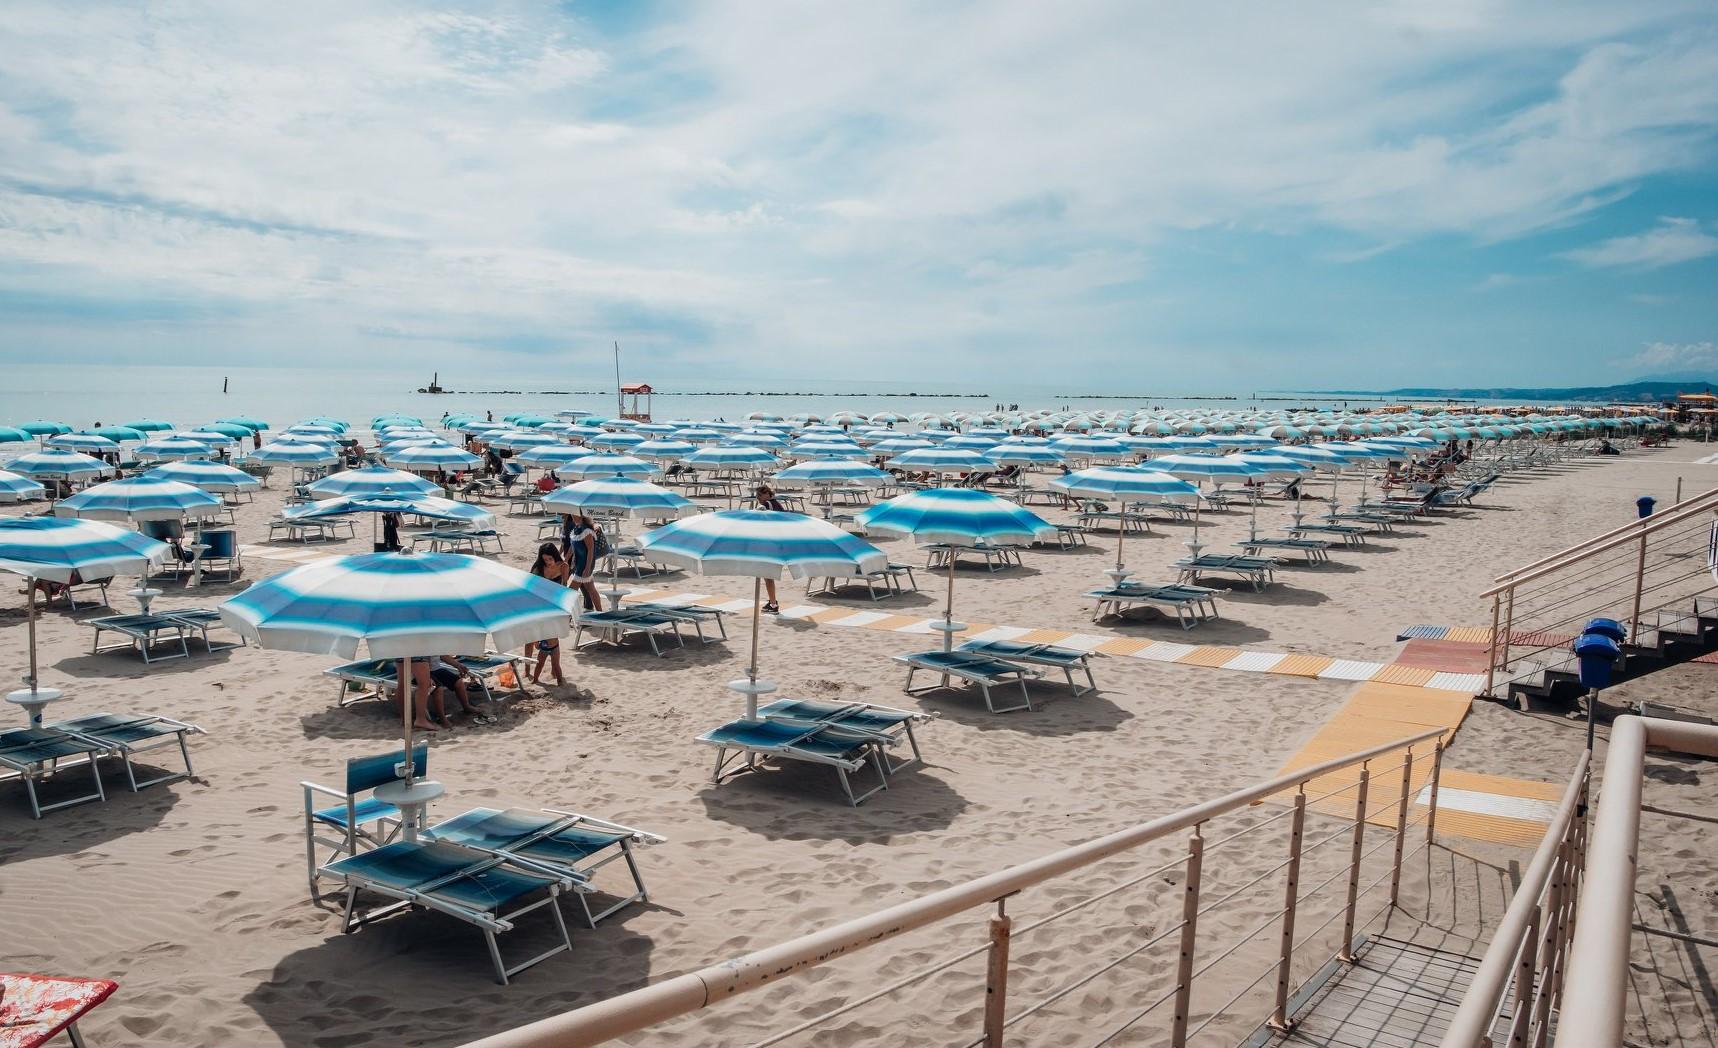 Chalet Miami Beach